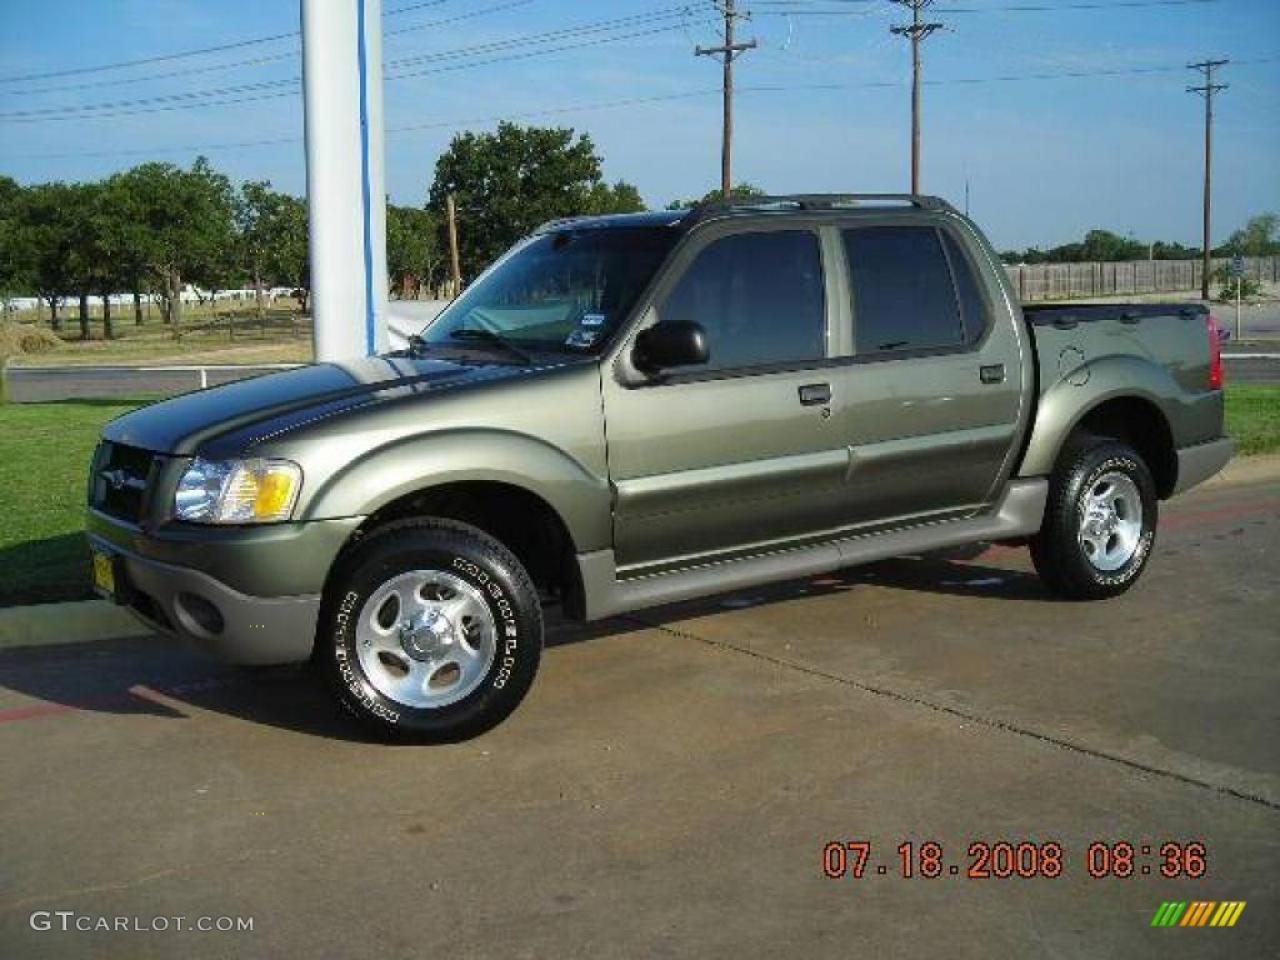 Ford explorer sport trac 4 800 1024 1280 1600 origin 2003